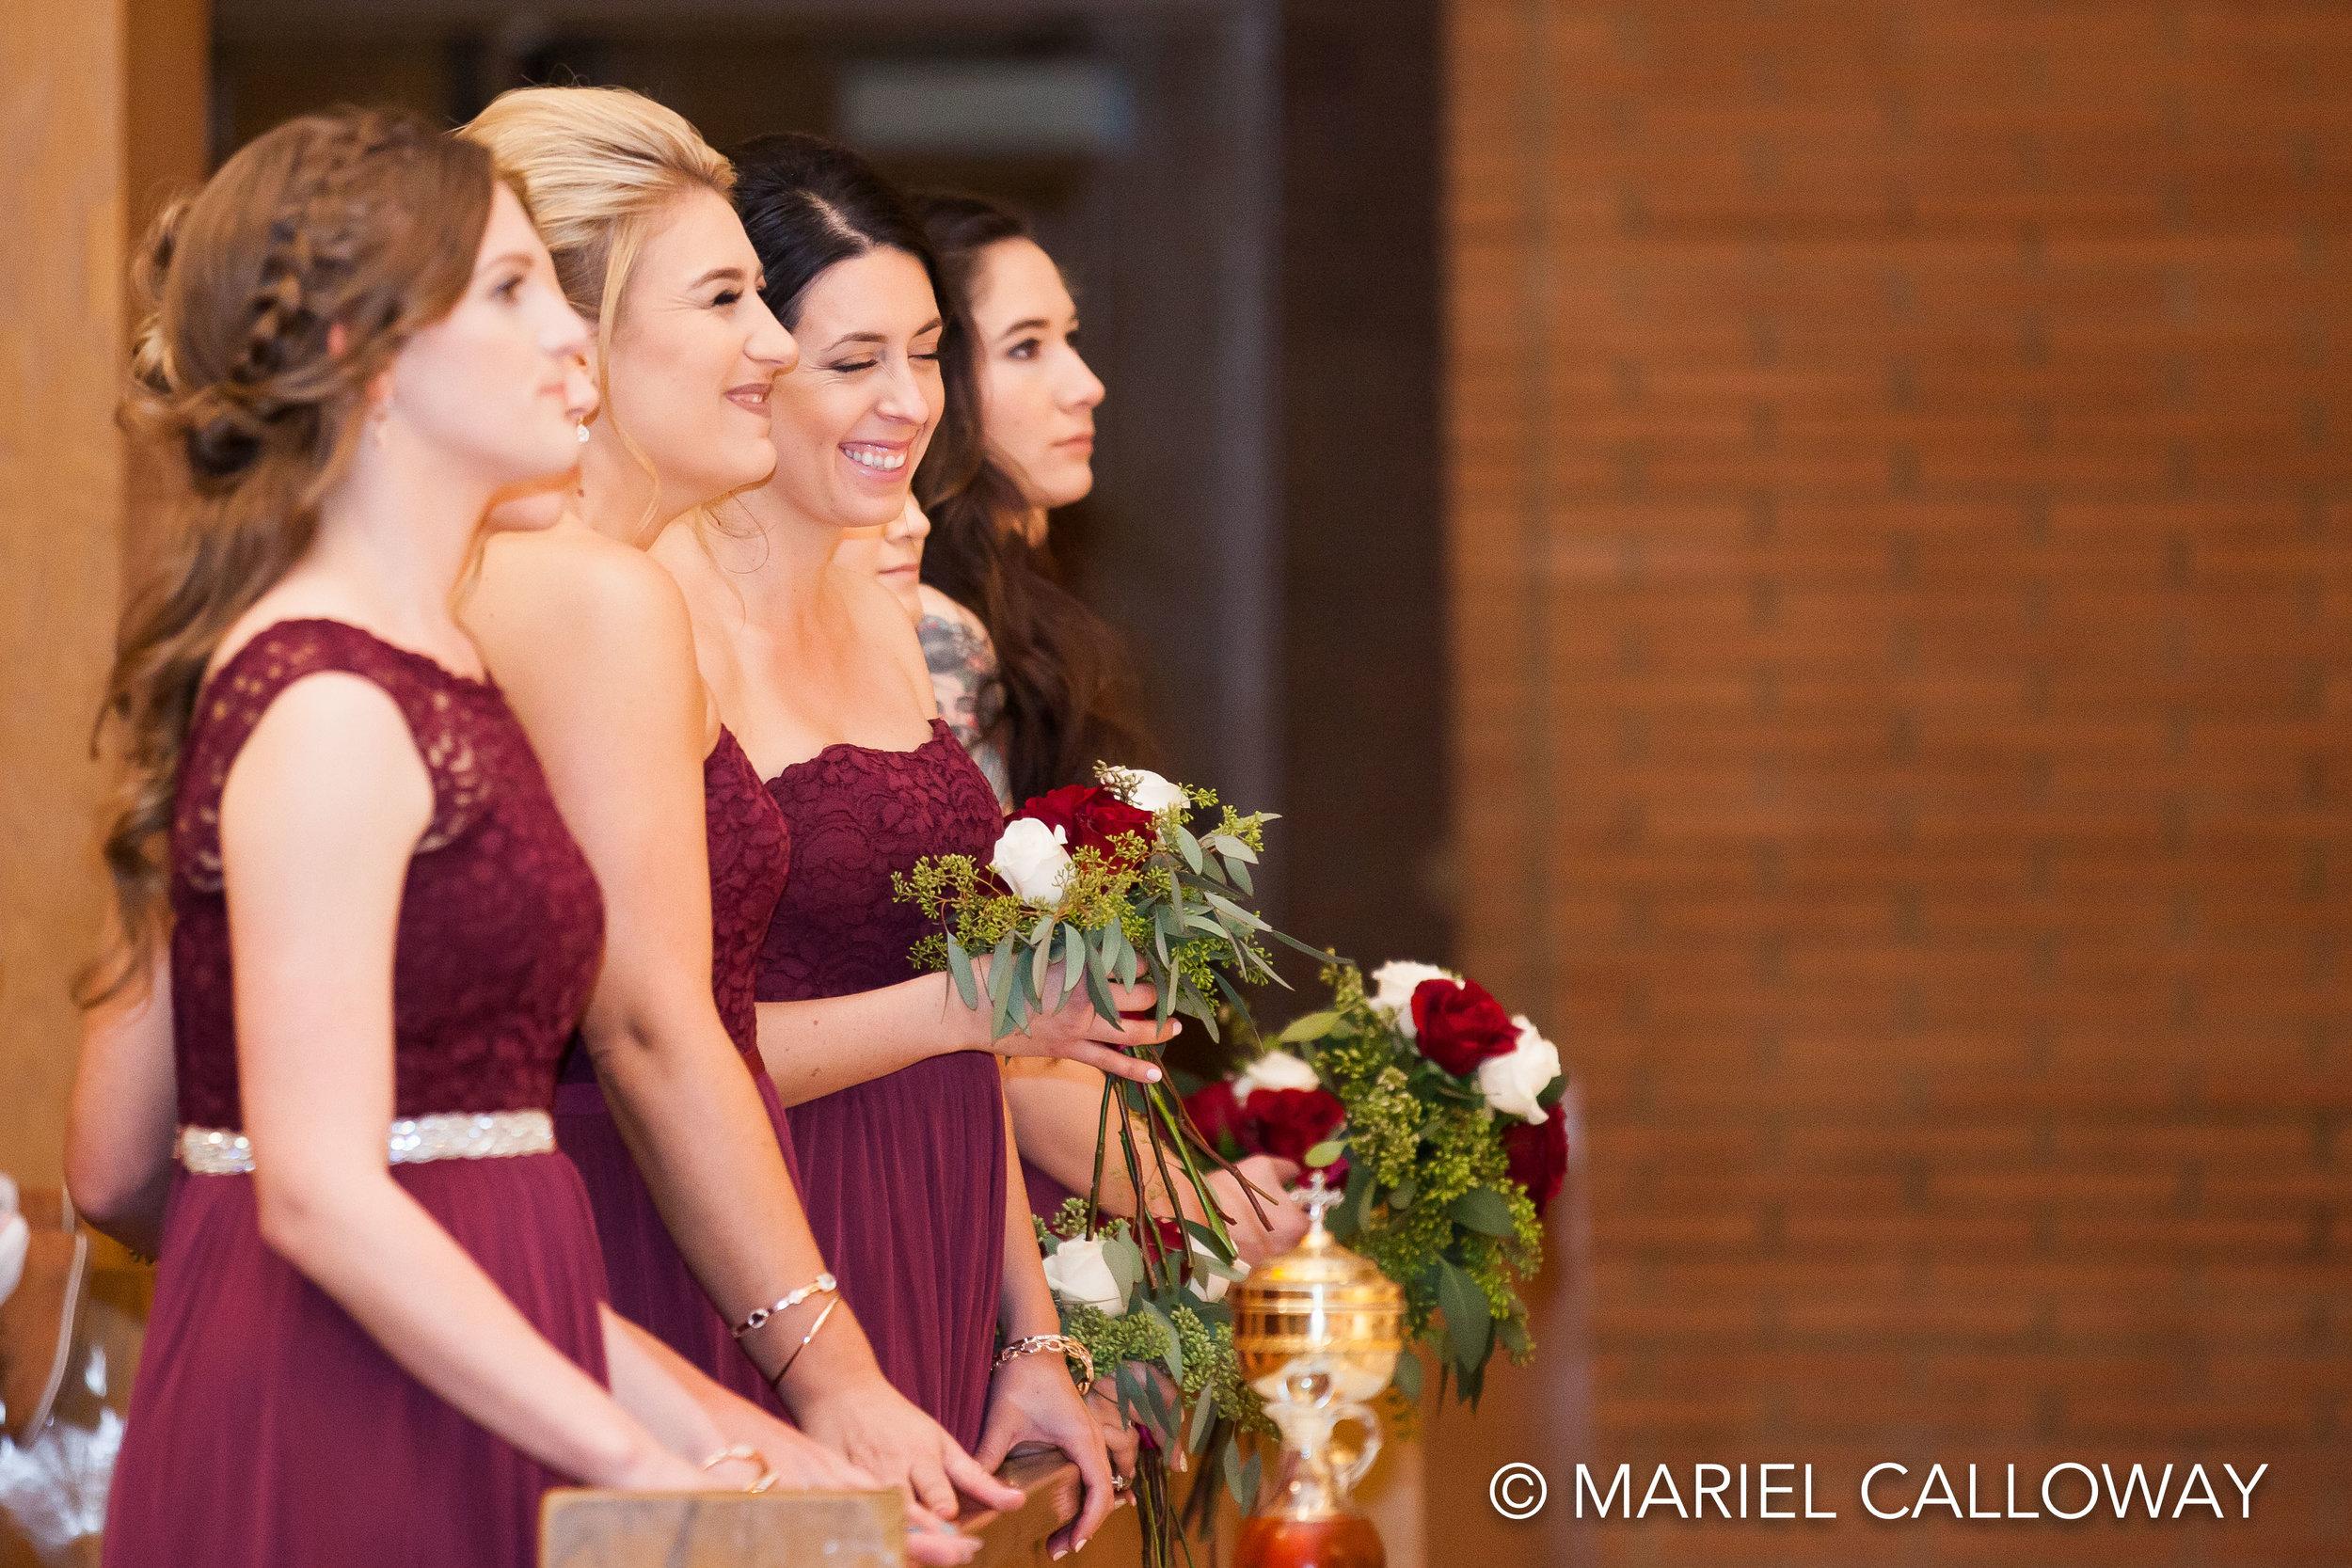 Mariel-Calloway-Los-Angeles-Wedding-Photography-Carmona-14.jpg